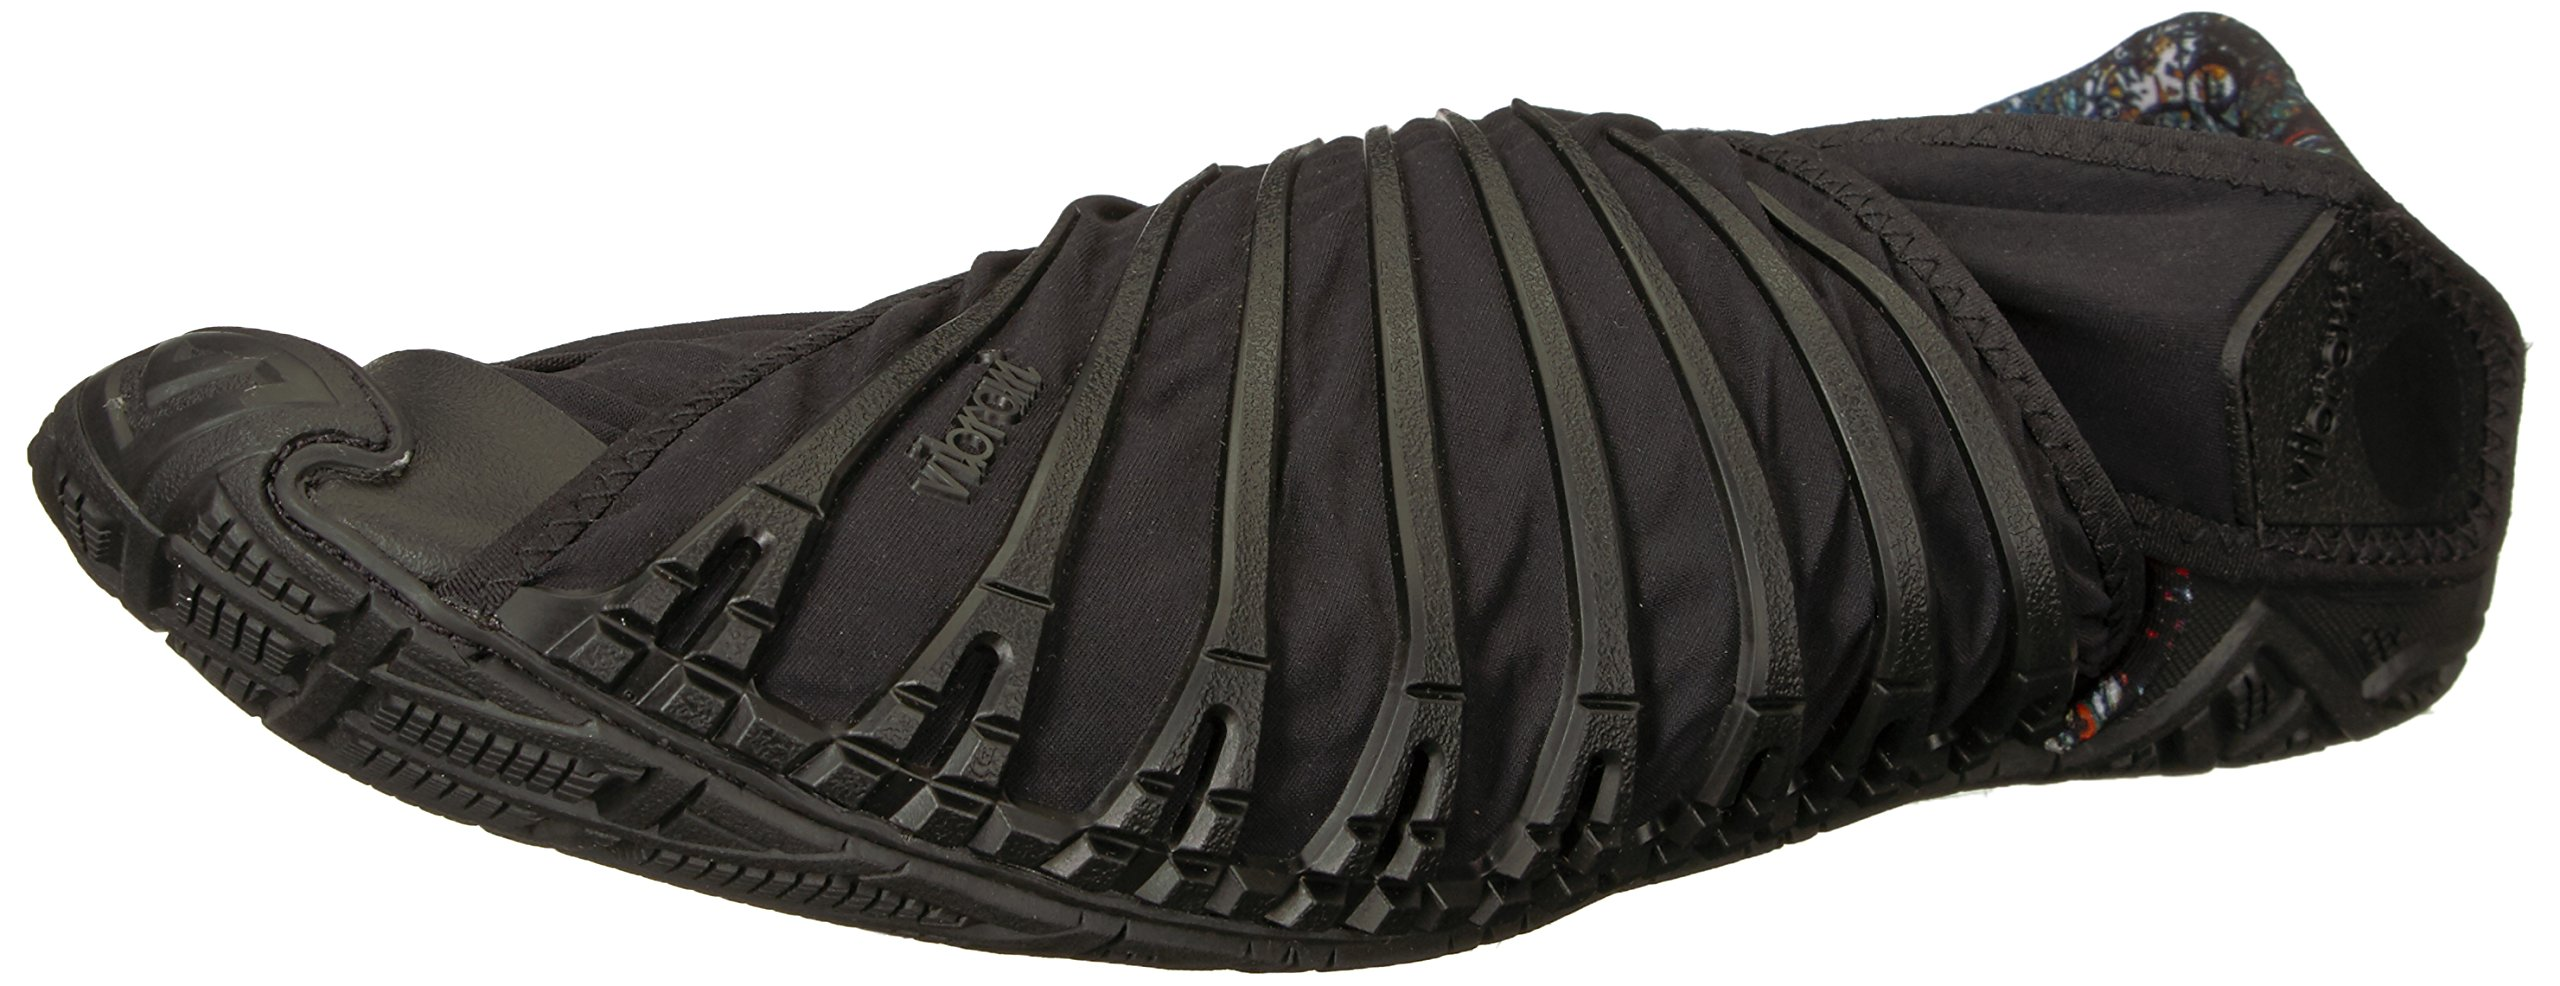 Vibram Women's Furoshiki Sneaker, Black, 41 EU/8.5-9 M US B EU (41 EU/8.5-9 US US)